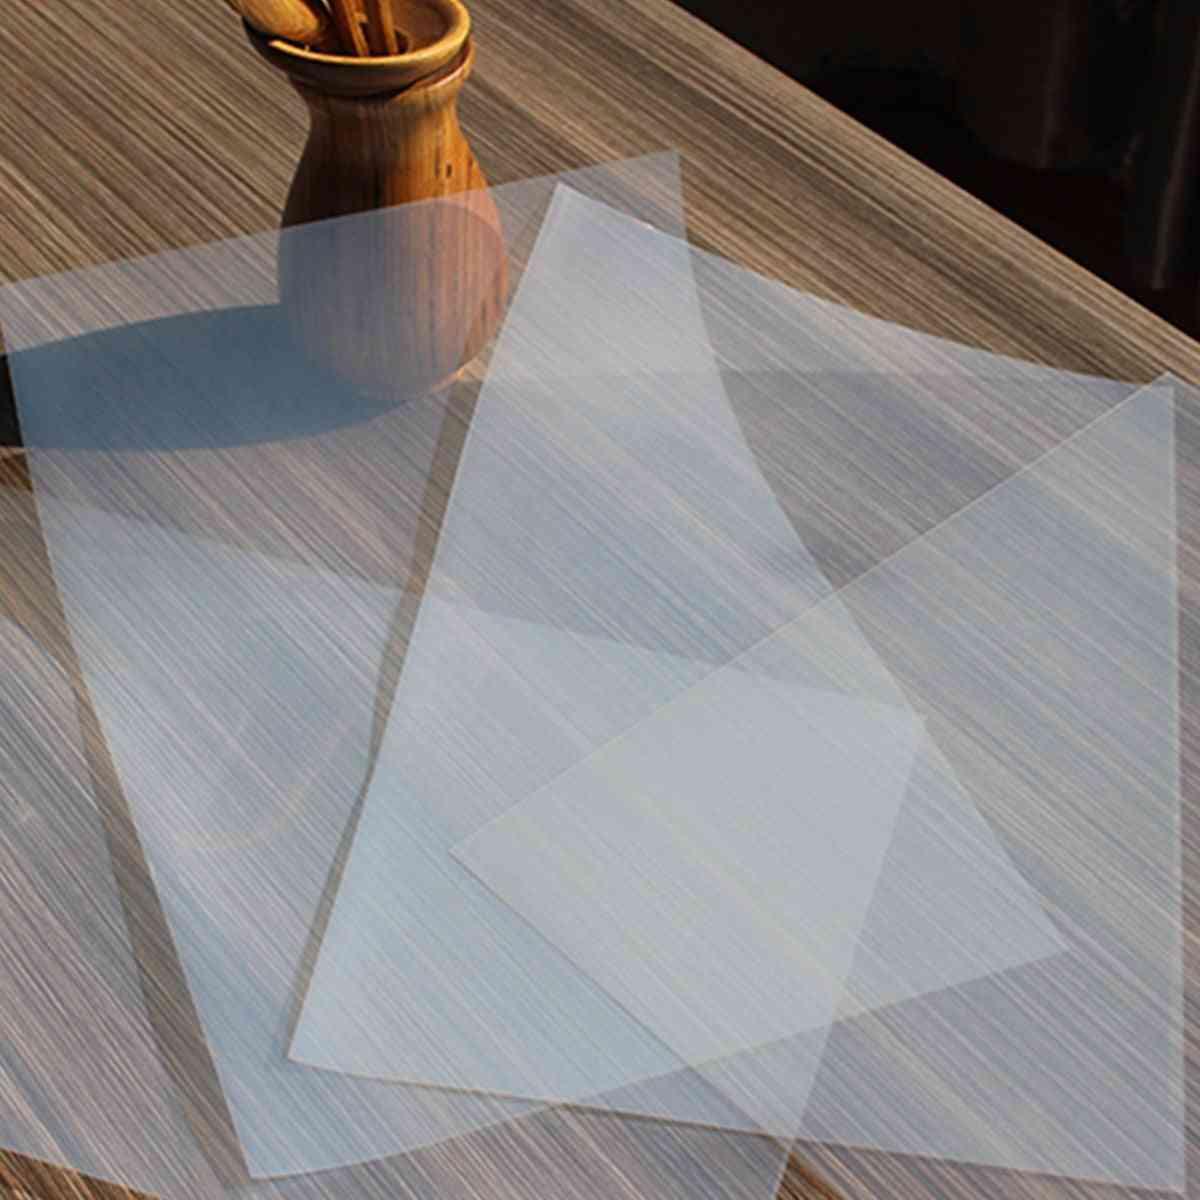 20 Sheet Of  Transparency Inkjet Film Paper